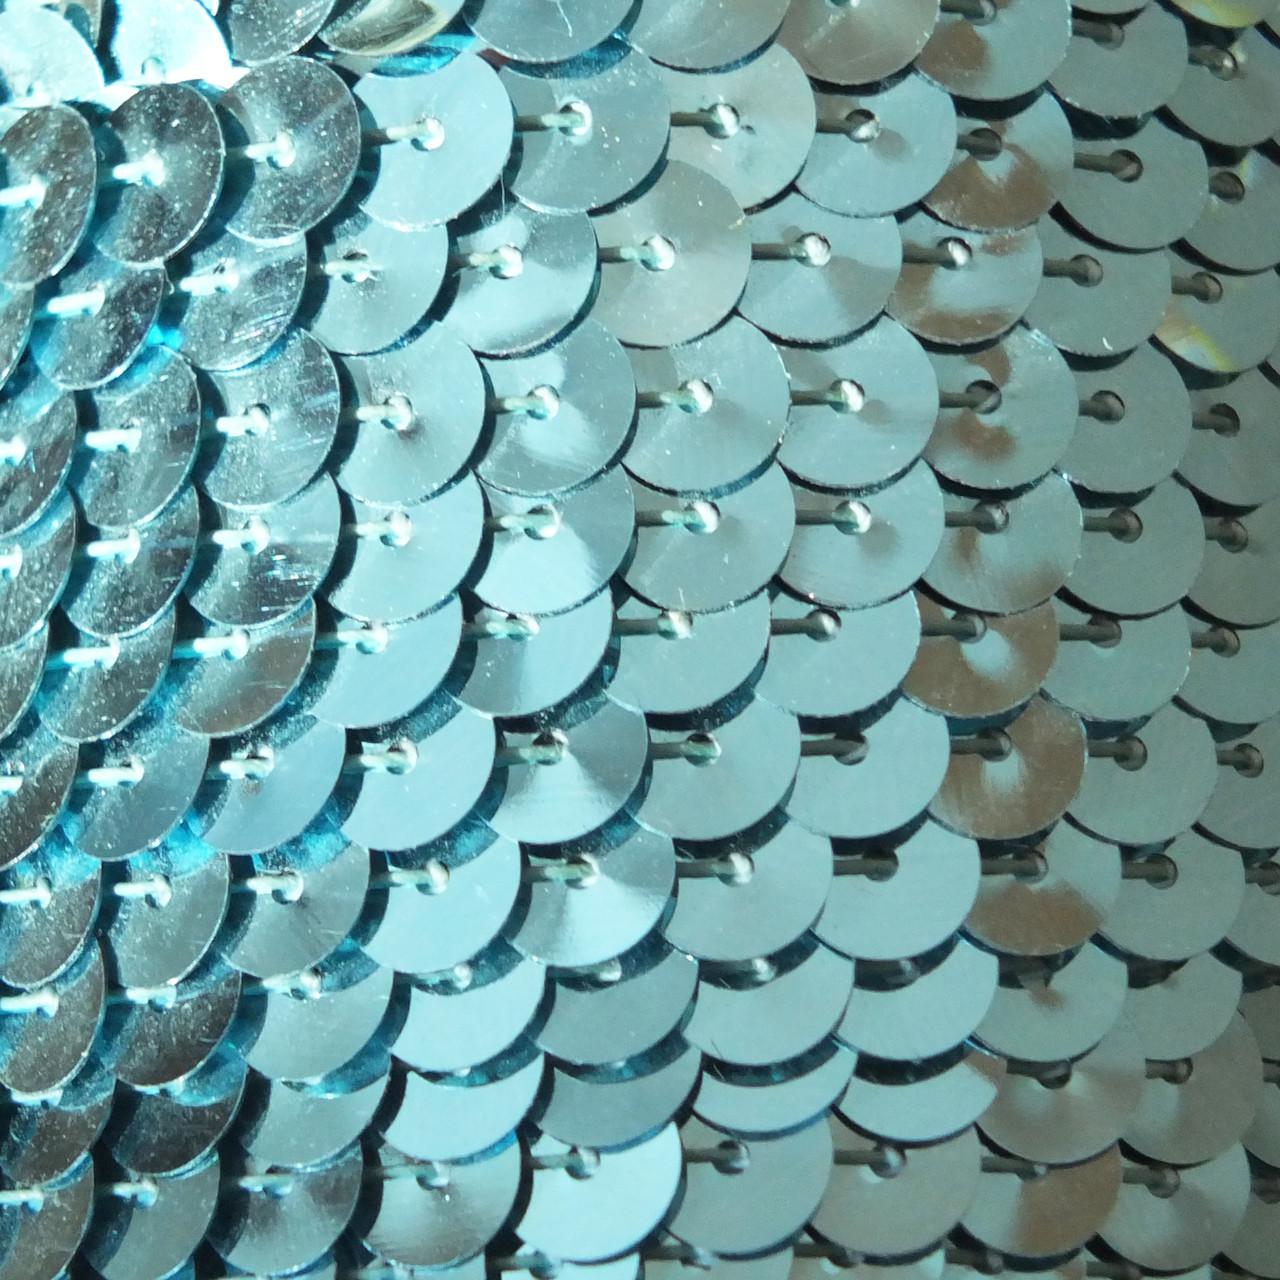 6mm Flat Round Sequin Trim Light Aqua Blue Shiny Metallic